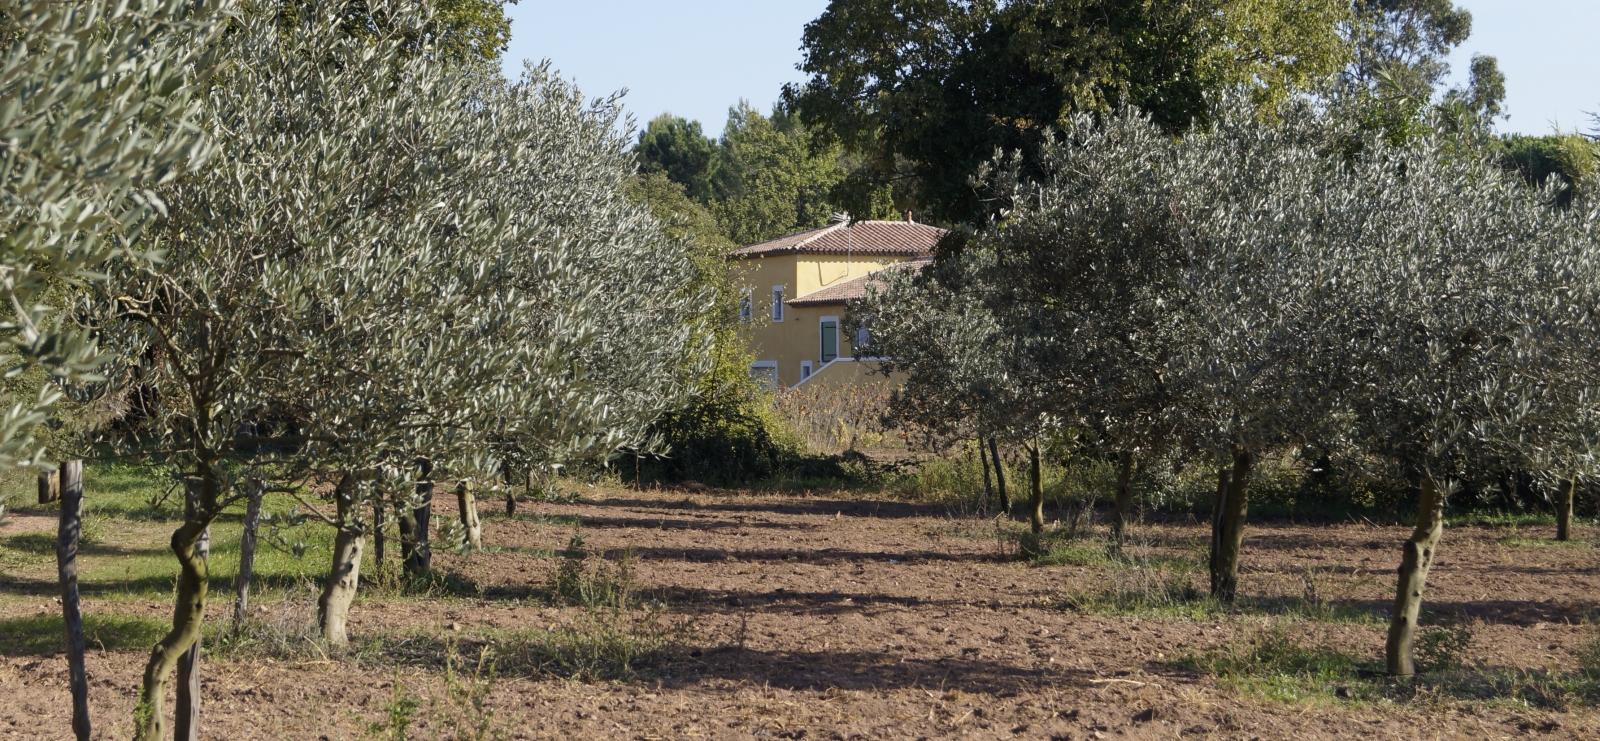 Domaine Oléicole Diouloufet